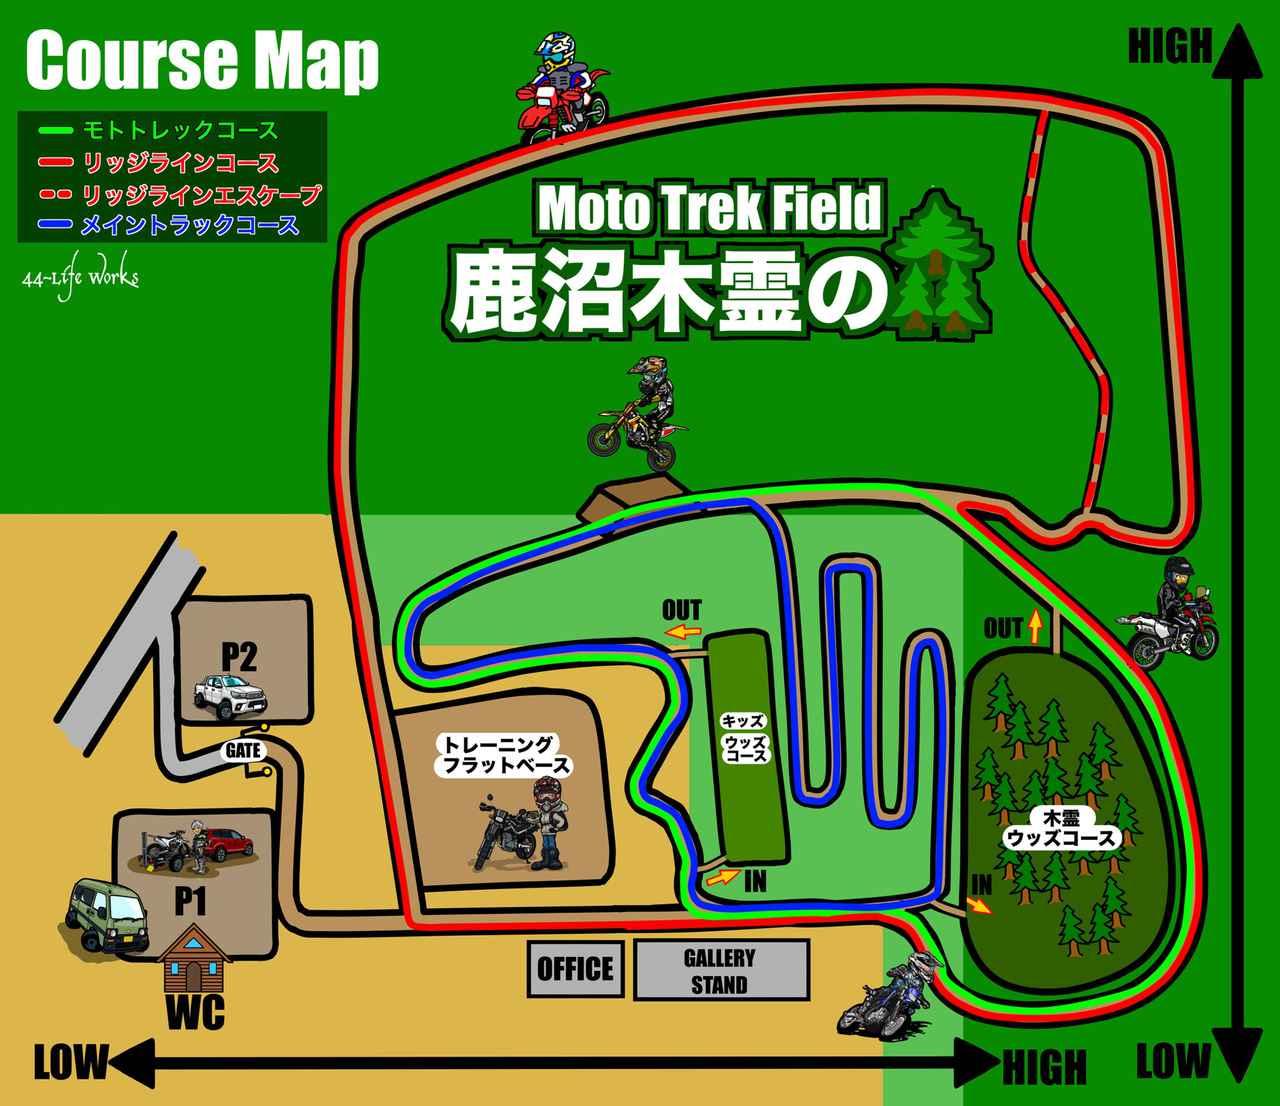 画像: 鹿沼木霊の森 Kodamanomori mototrekfield 鹿沼木霊の森 | 日本